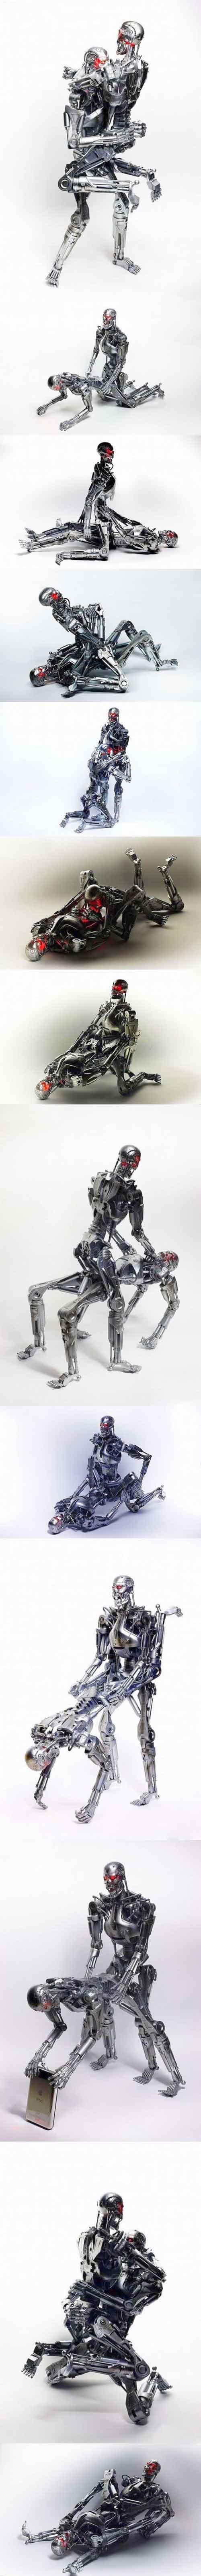 Terminator Kama Sutra